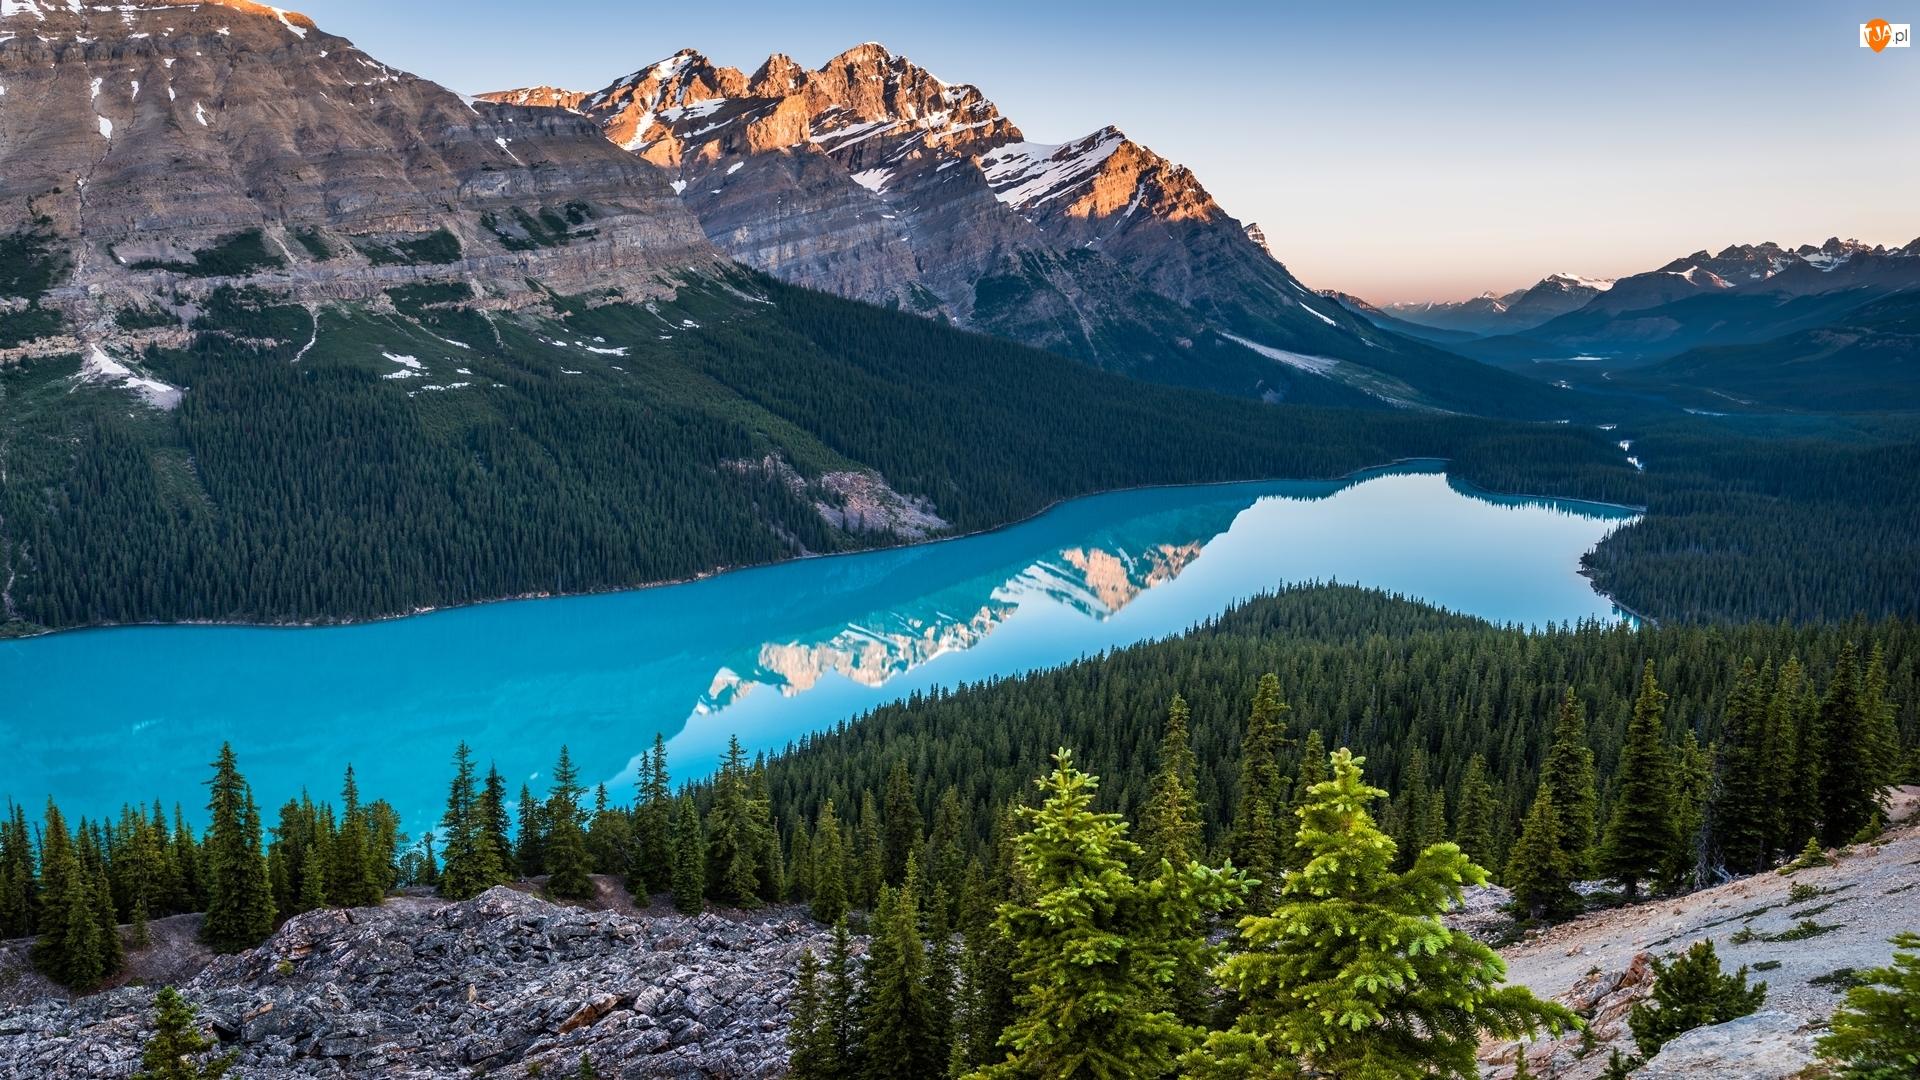 Jezioro Peyto Lake, Lasy, Park Narodowy Banff, Kanada, Góry Canadian Rockies